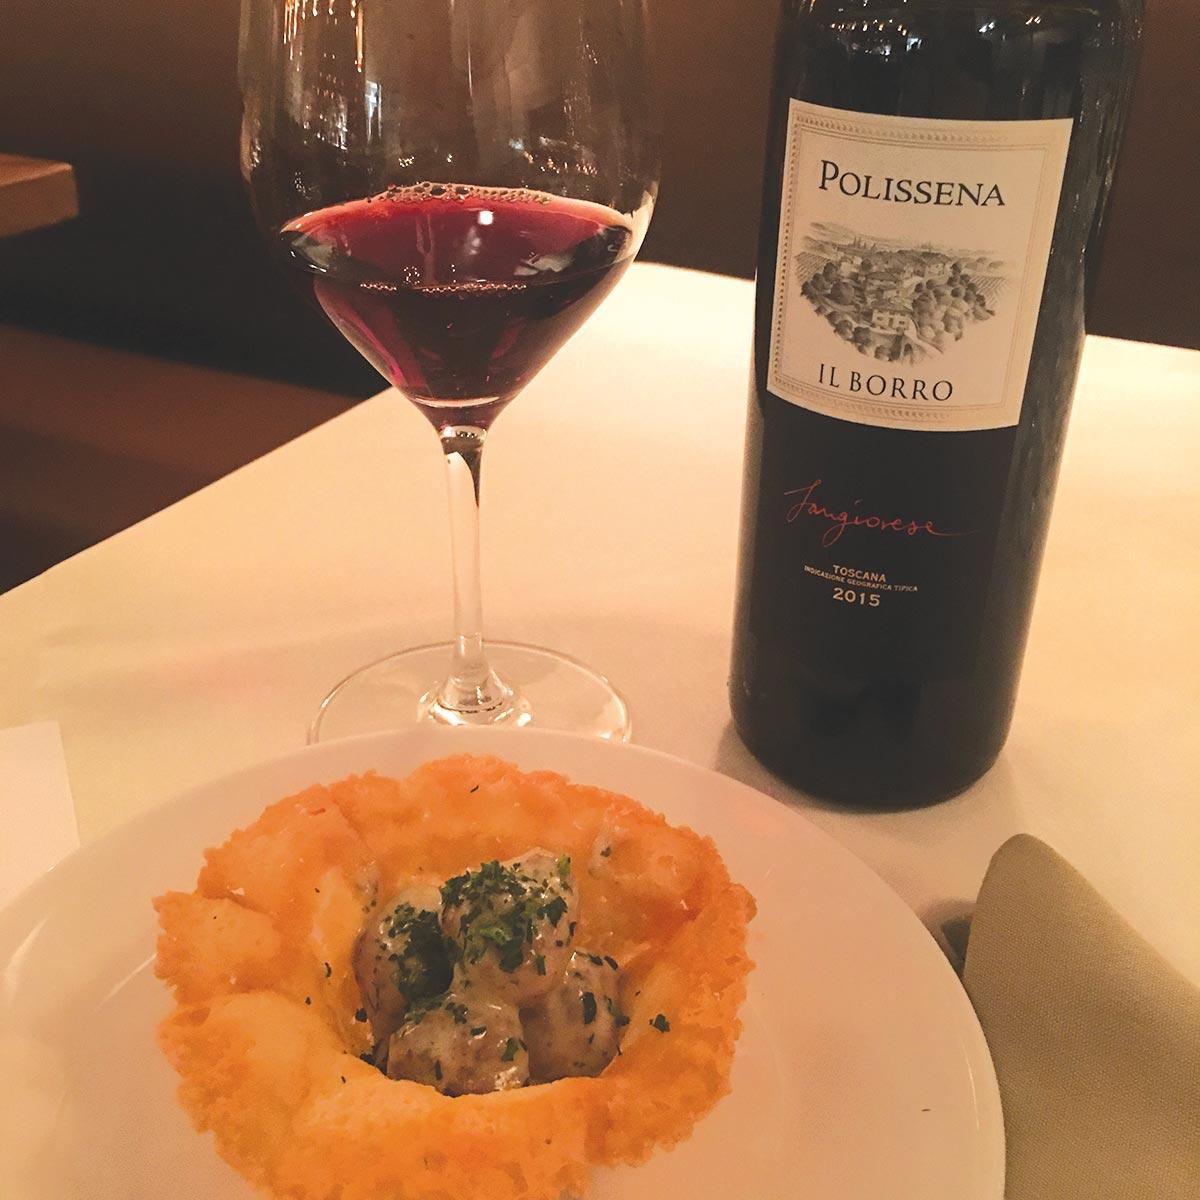 Angelini Wine Features Il Borro Wines at Benefit Wine Dinner